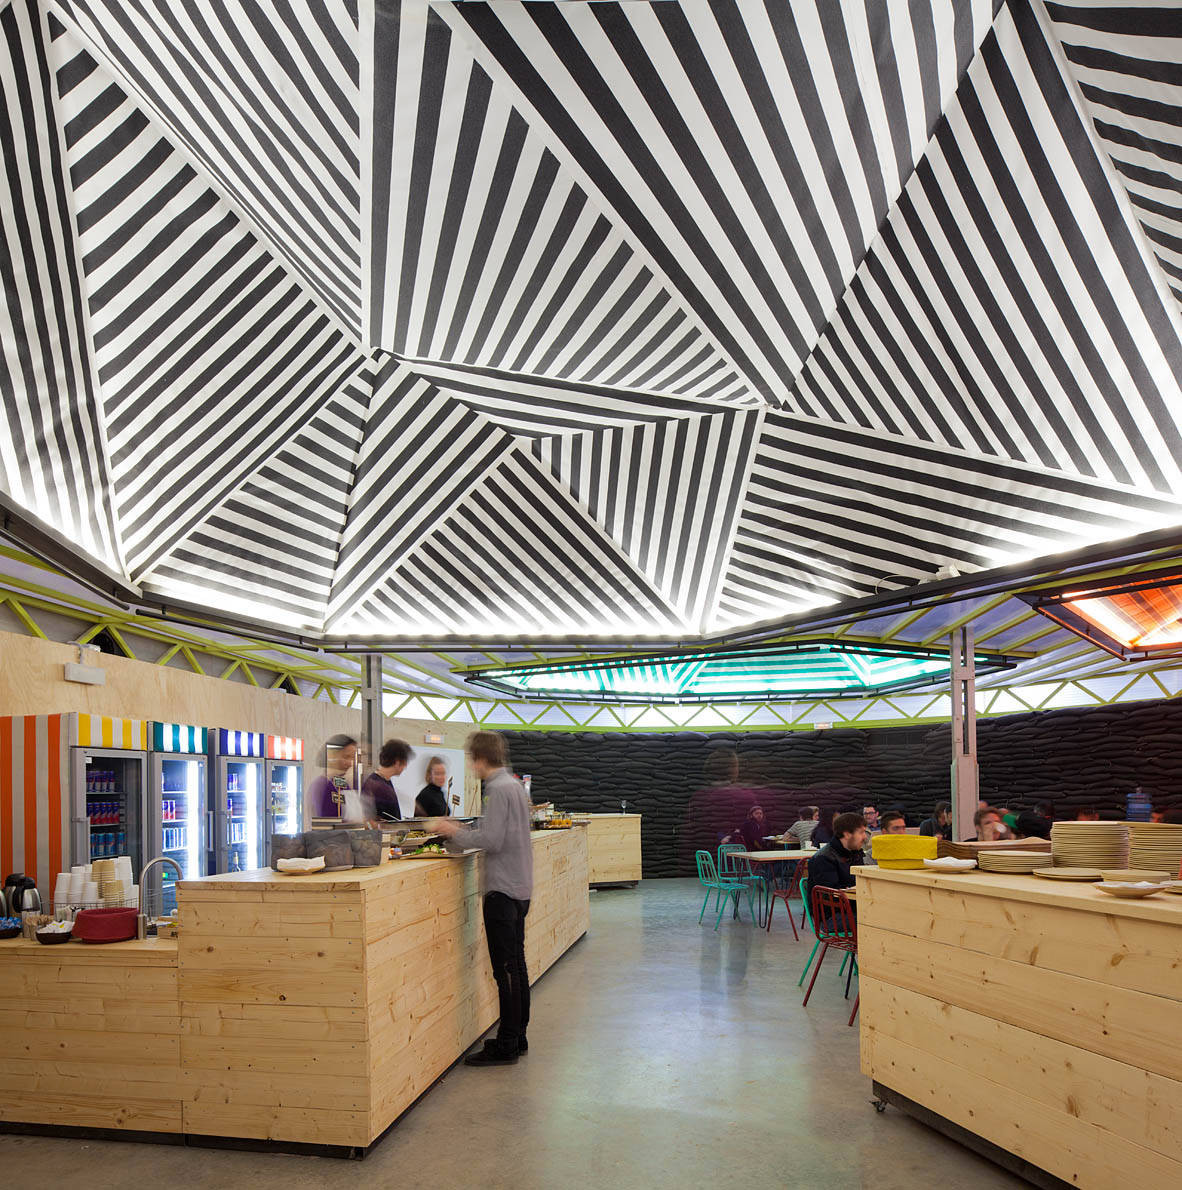 Red Bull Music Academy / Langarita-Navarro Arquitectos, © Miguel de Guzmán